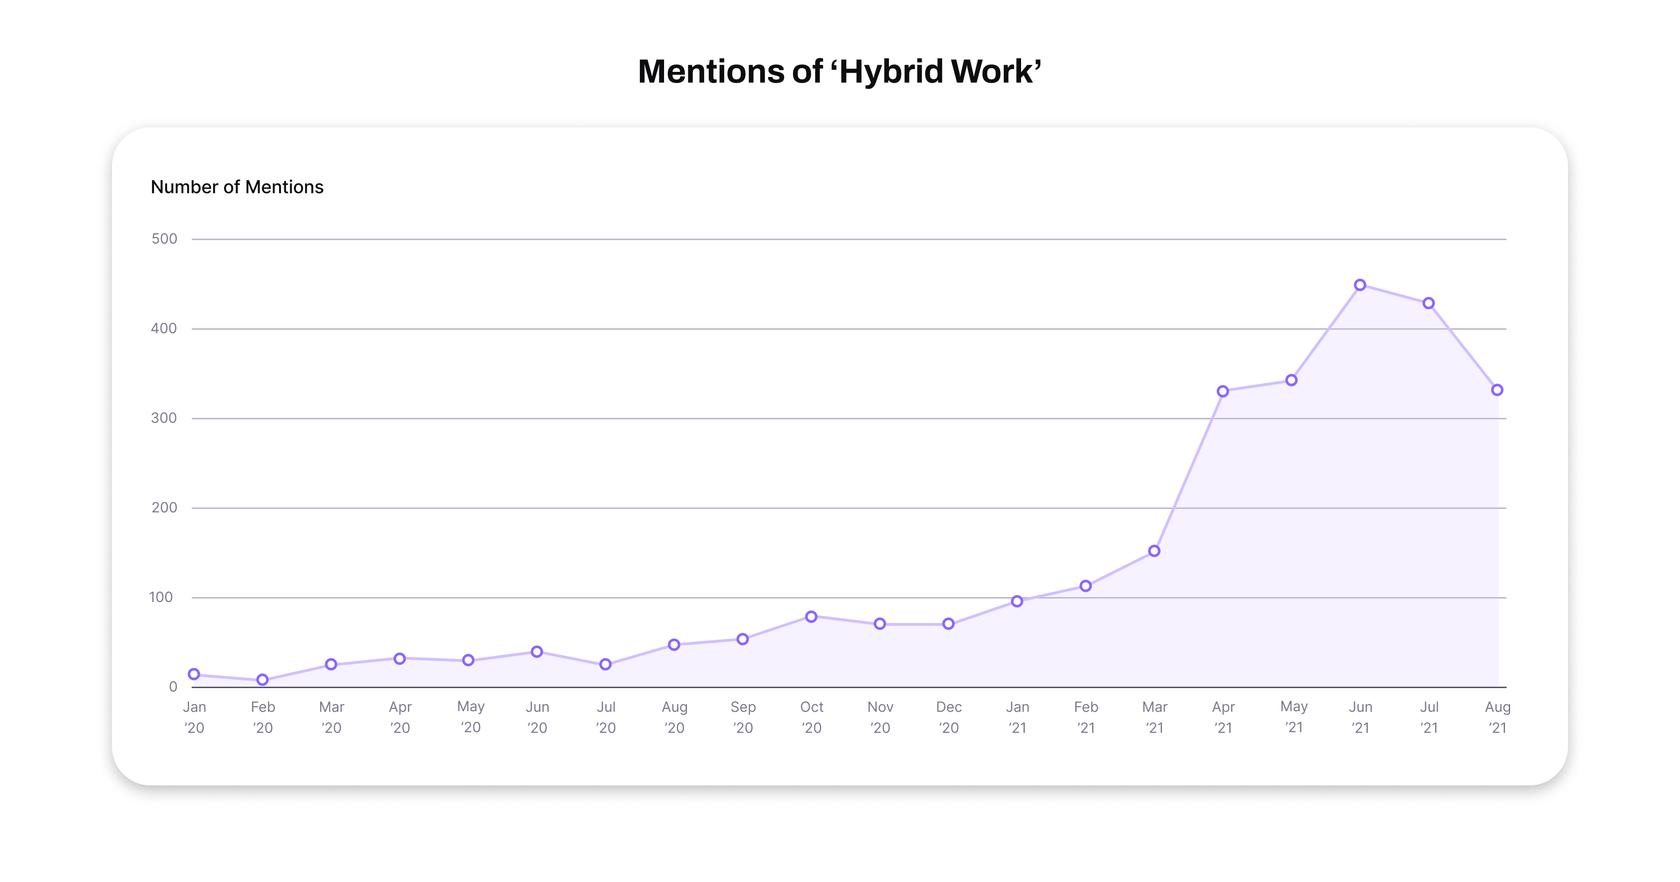 mentions of hybrid work statistics